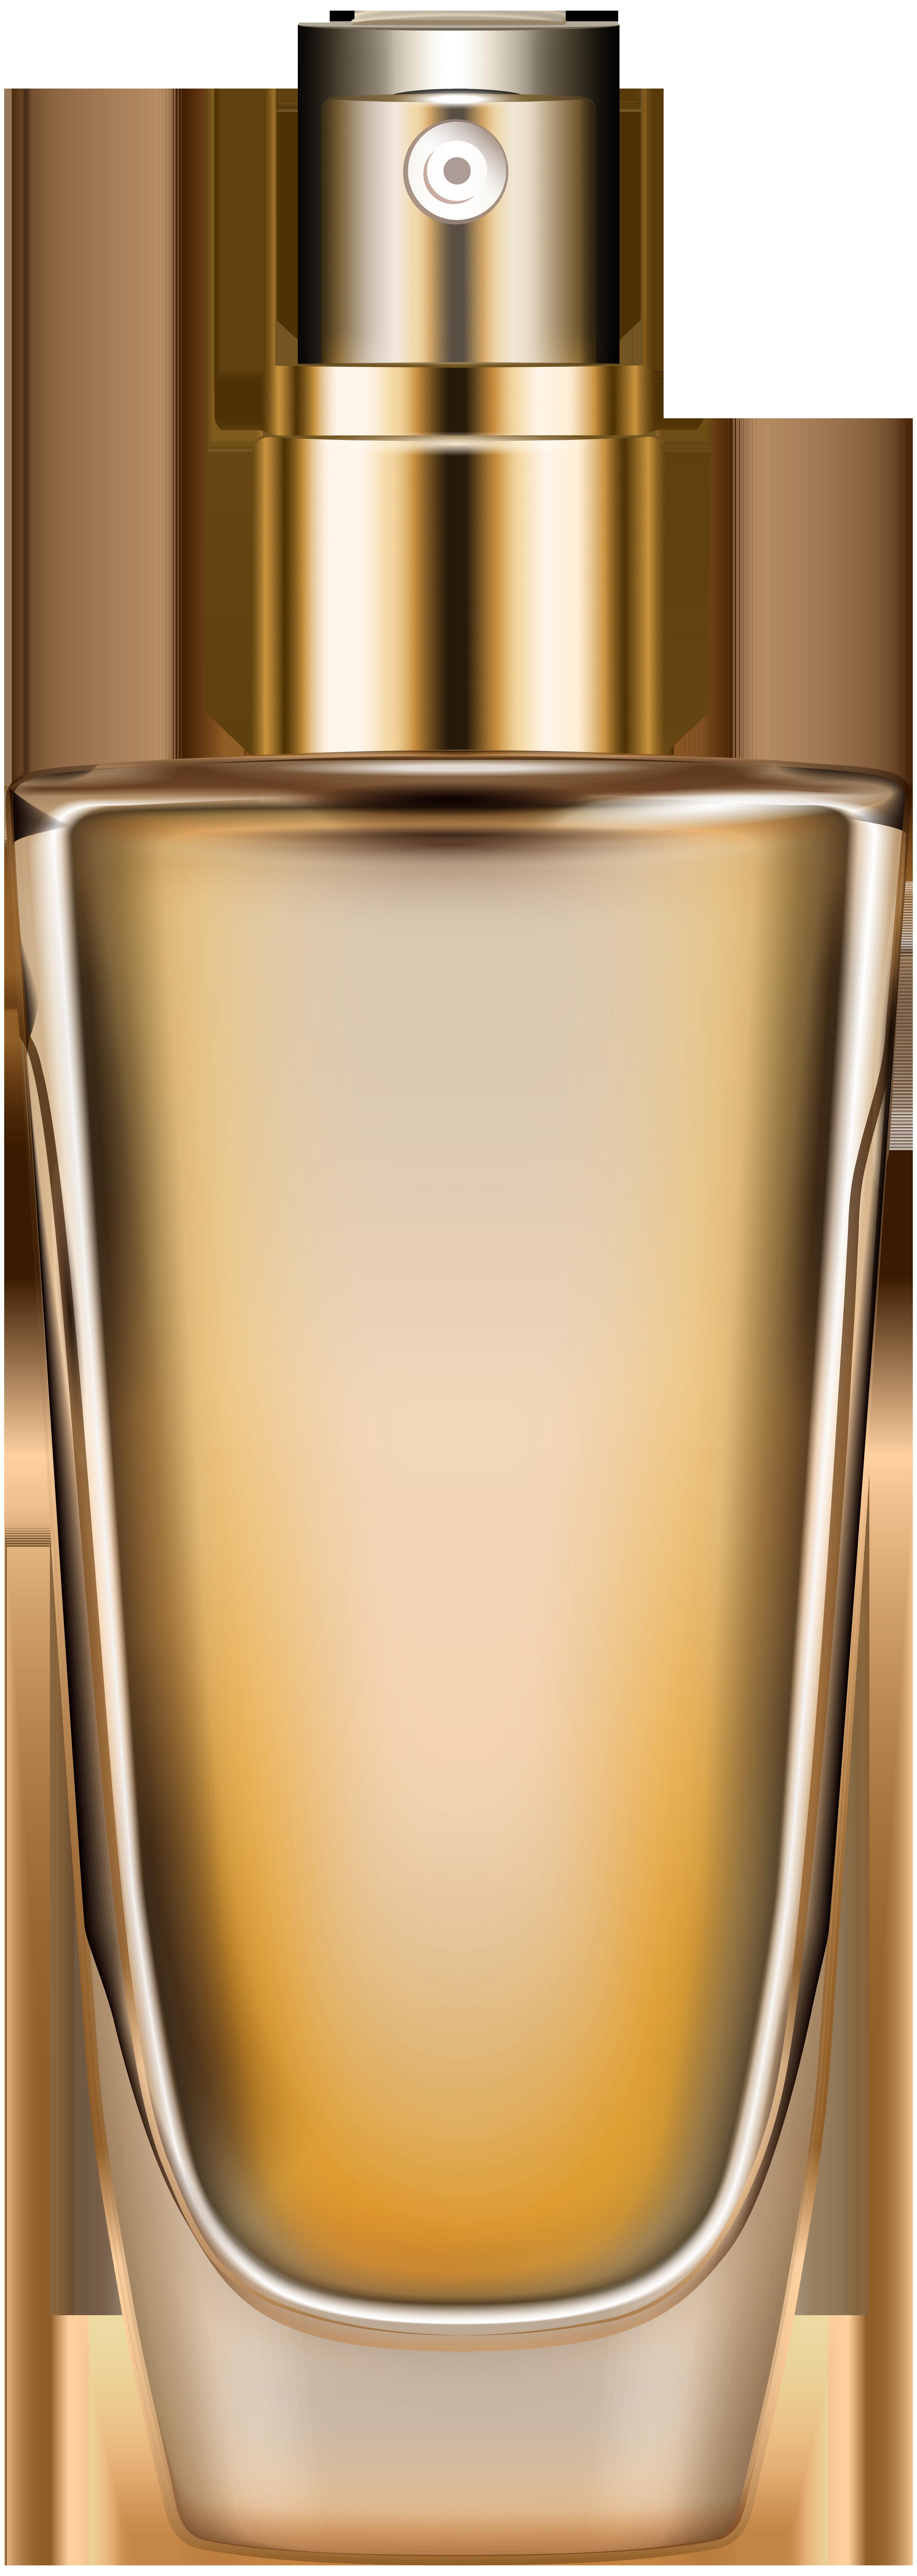 Clip art image gallery. Perfume clipart transparent